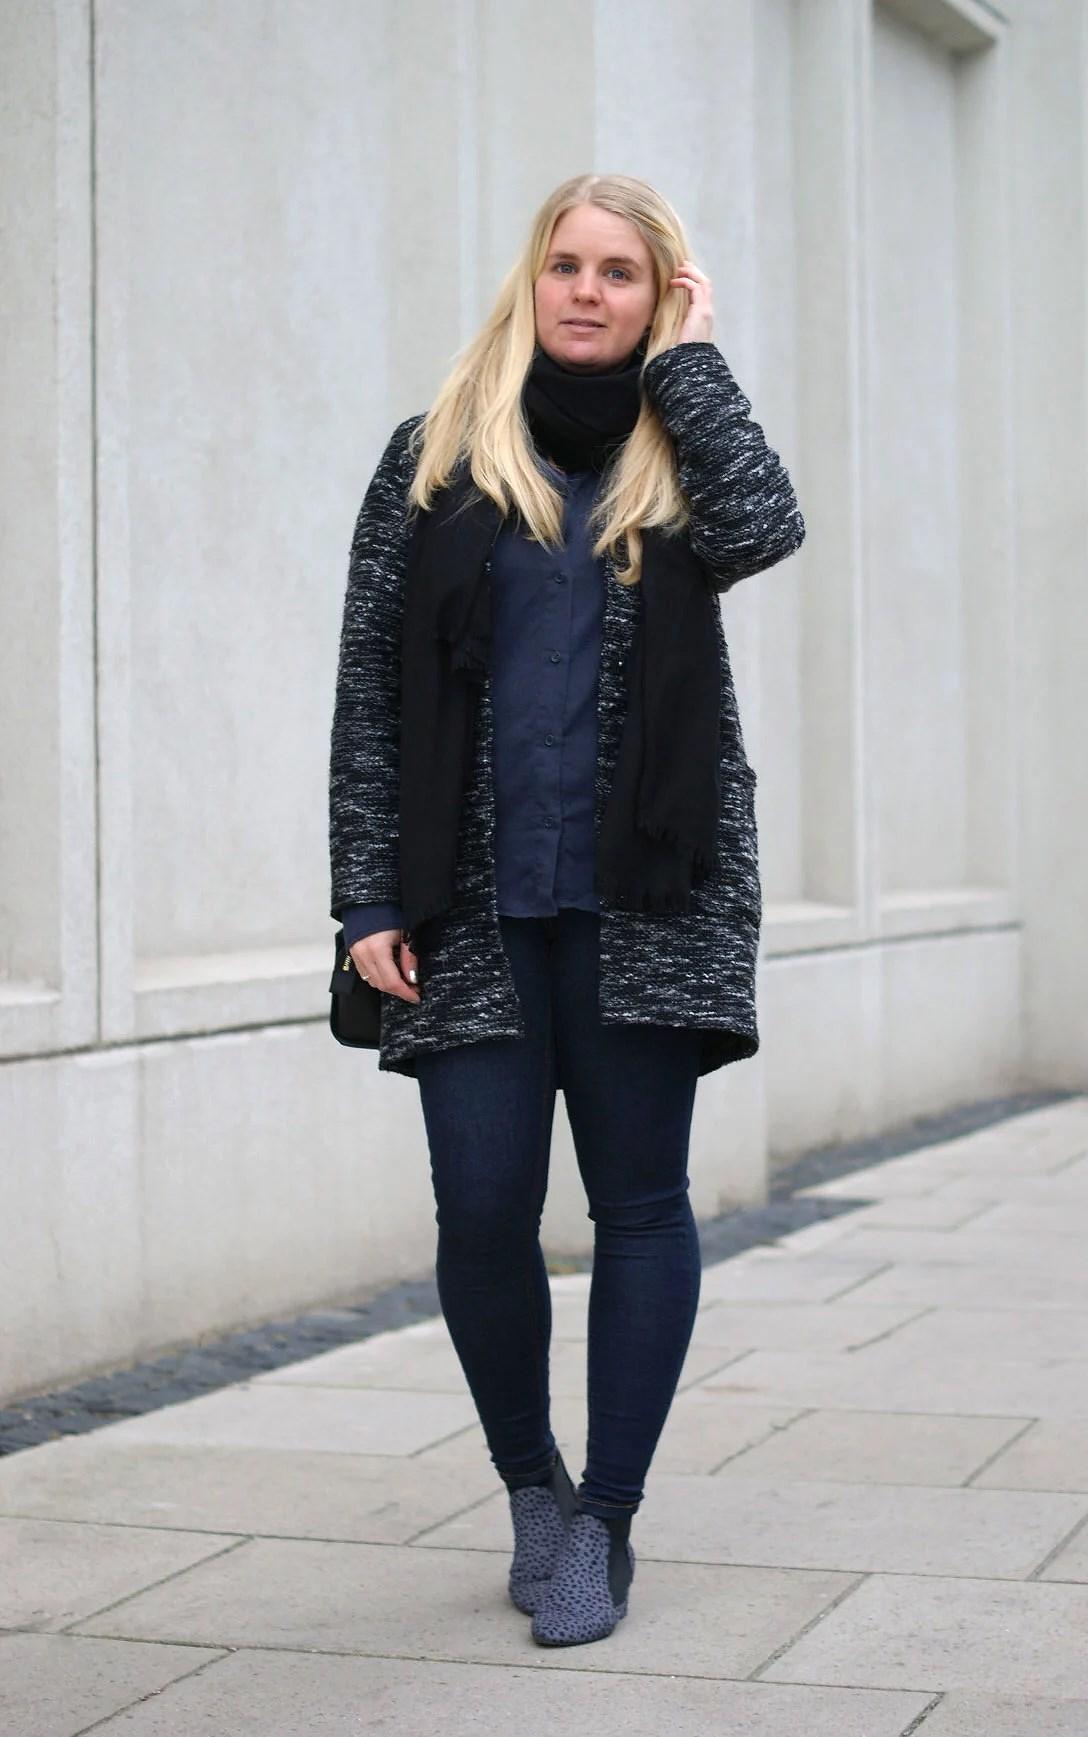 It's My Passions, Modeblog, Mode, Julie Mænnchen